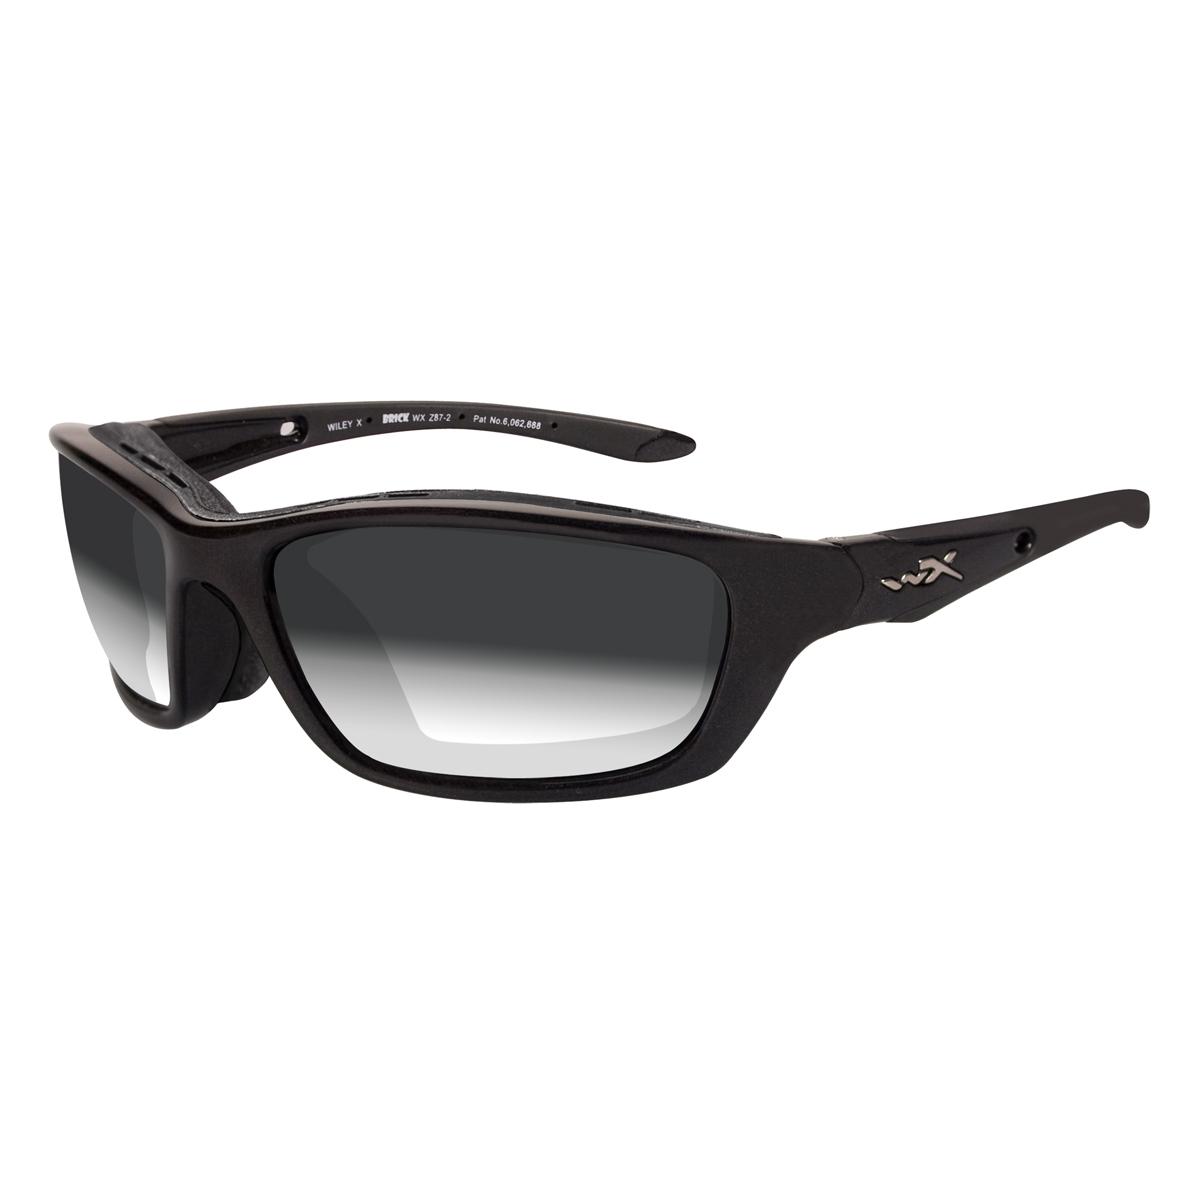 d722eacf23 Wiley X Jake Light Adjusting Sunglasses | United Nations System ...